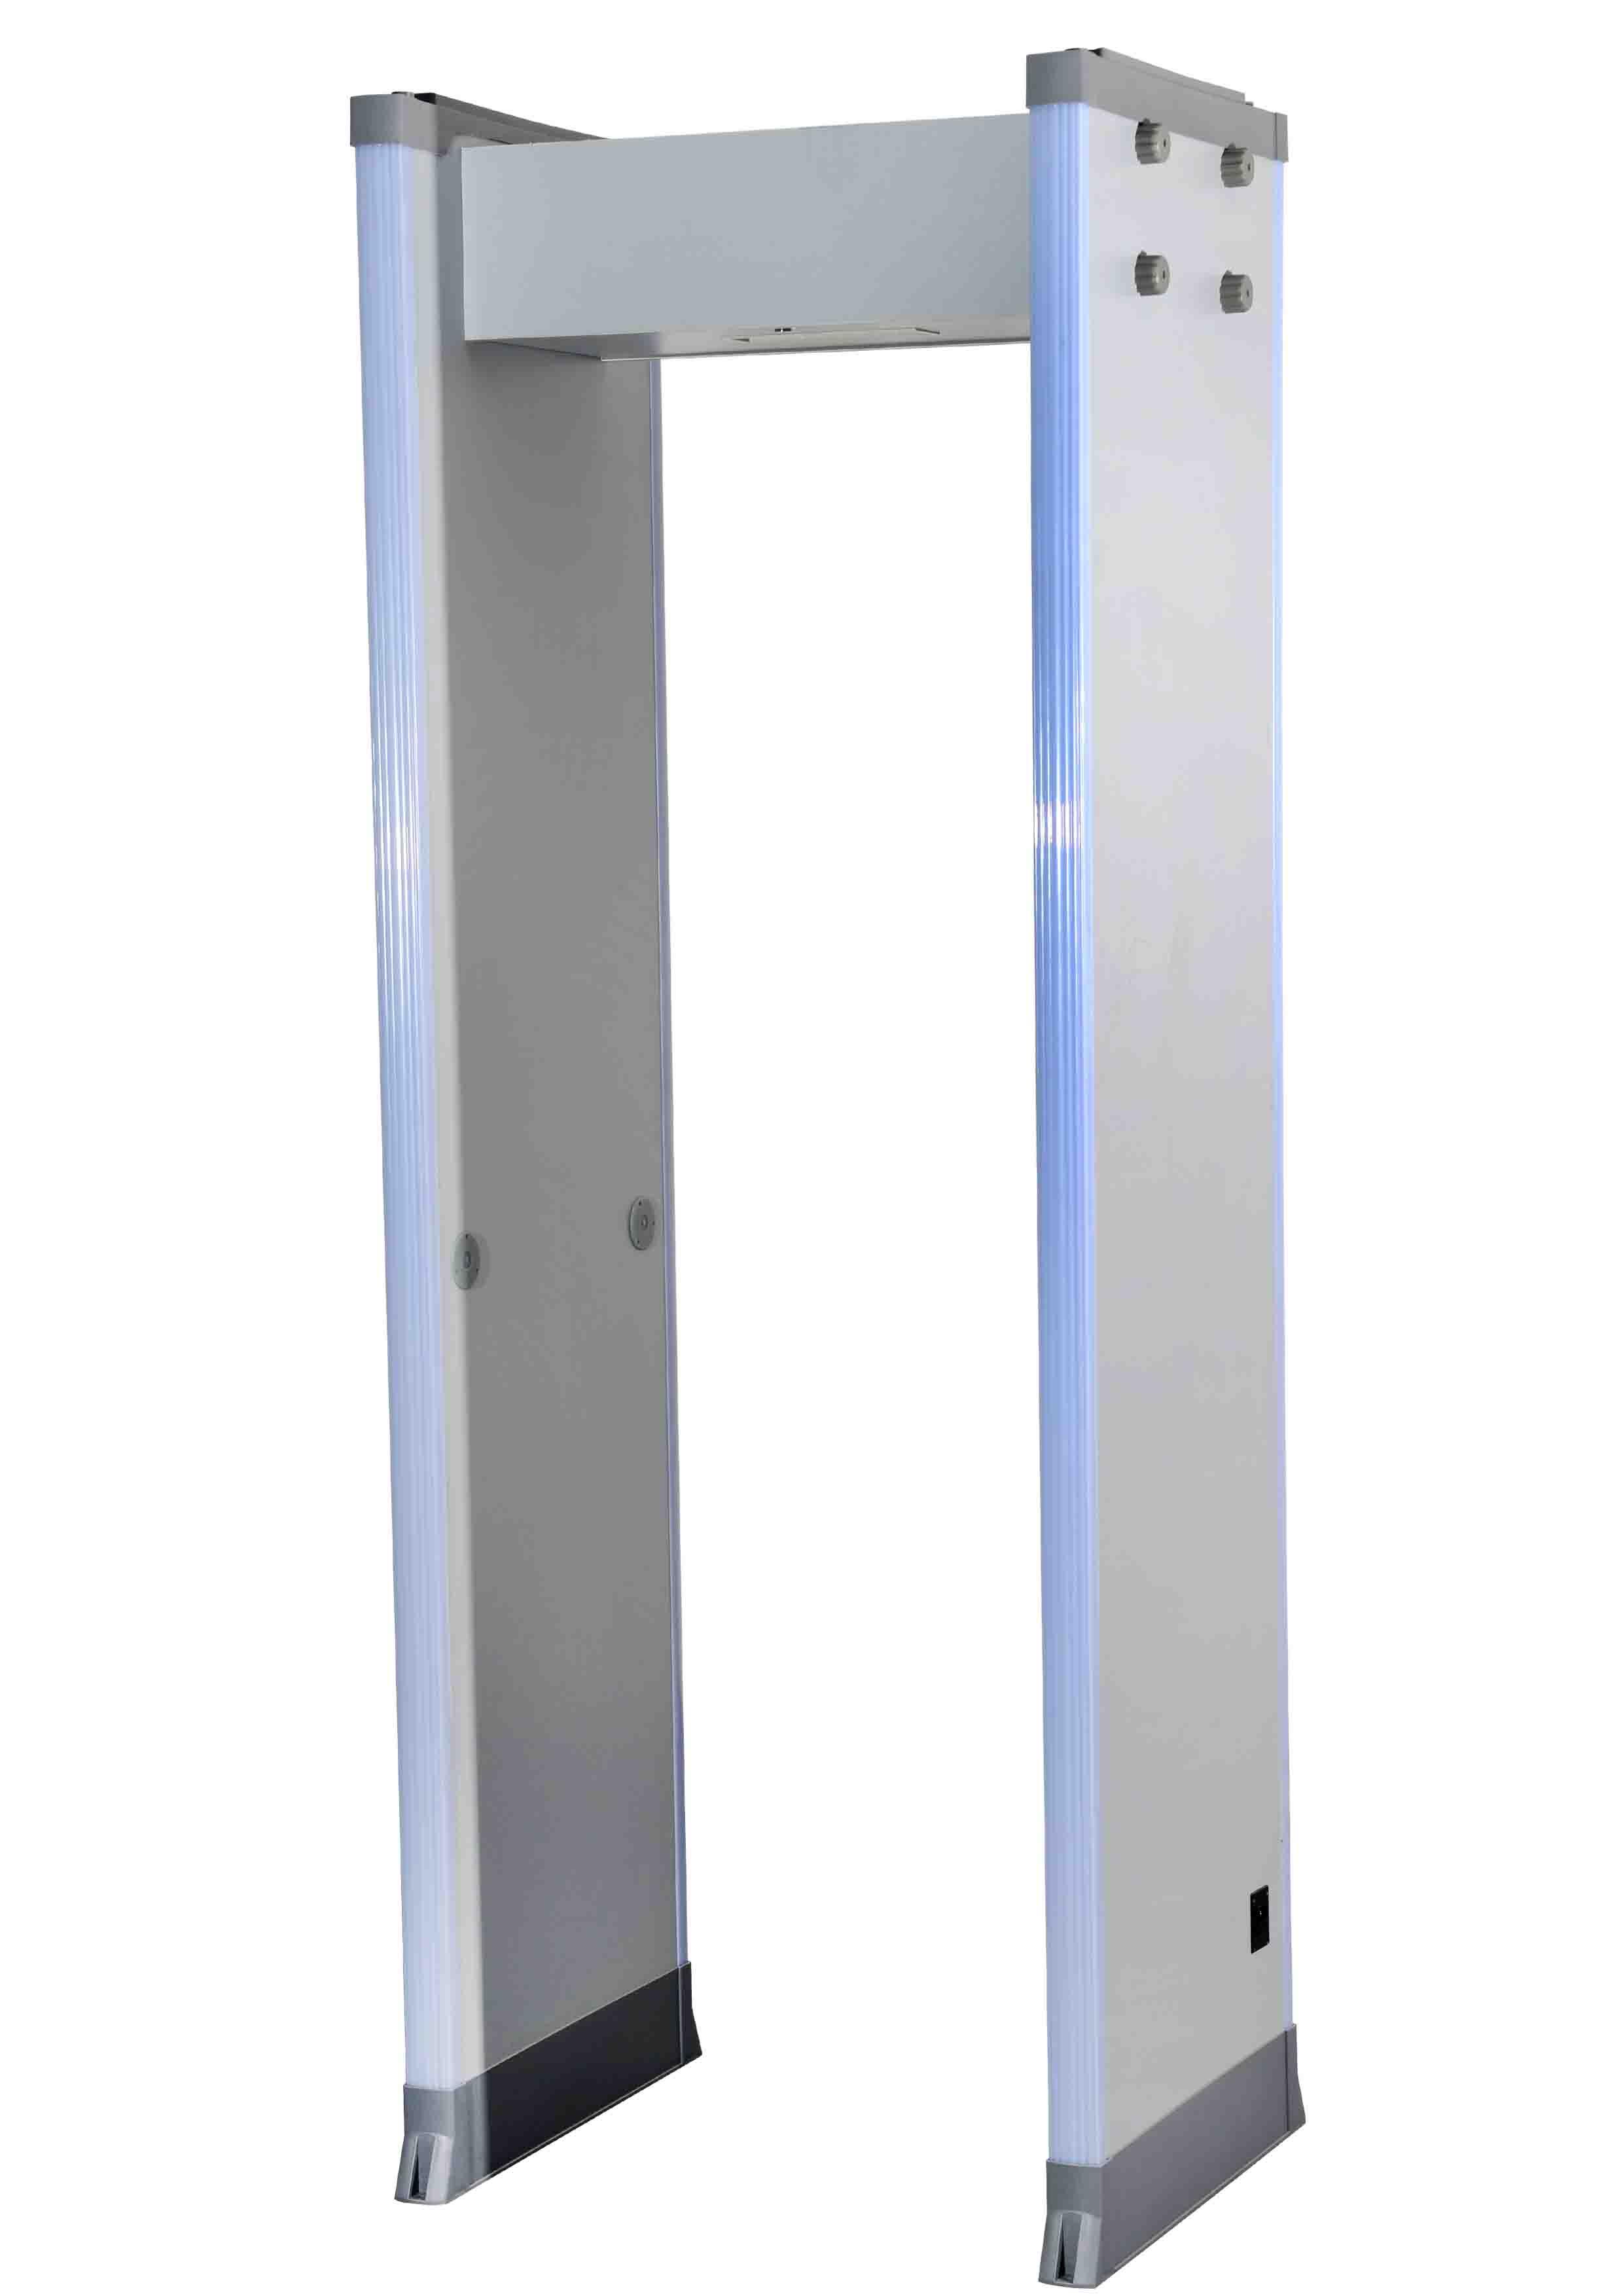 walk through metal security detector 18 Zones